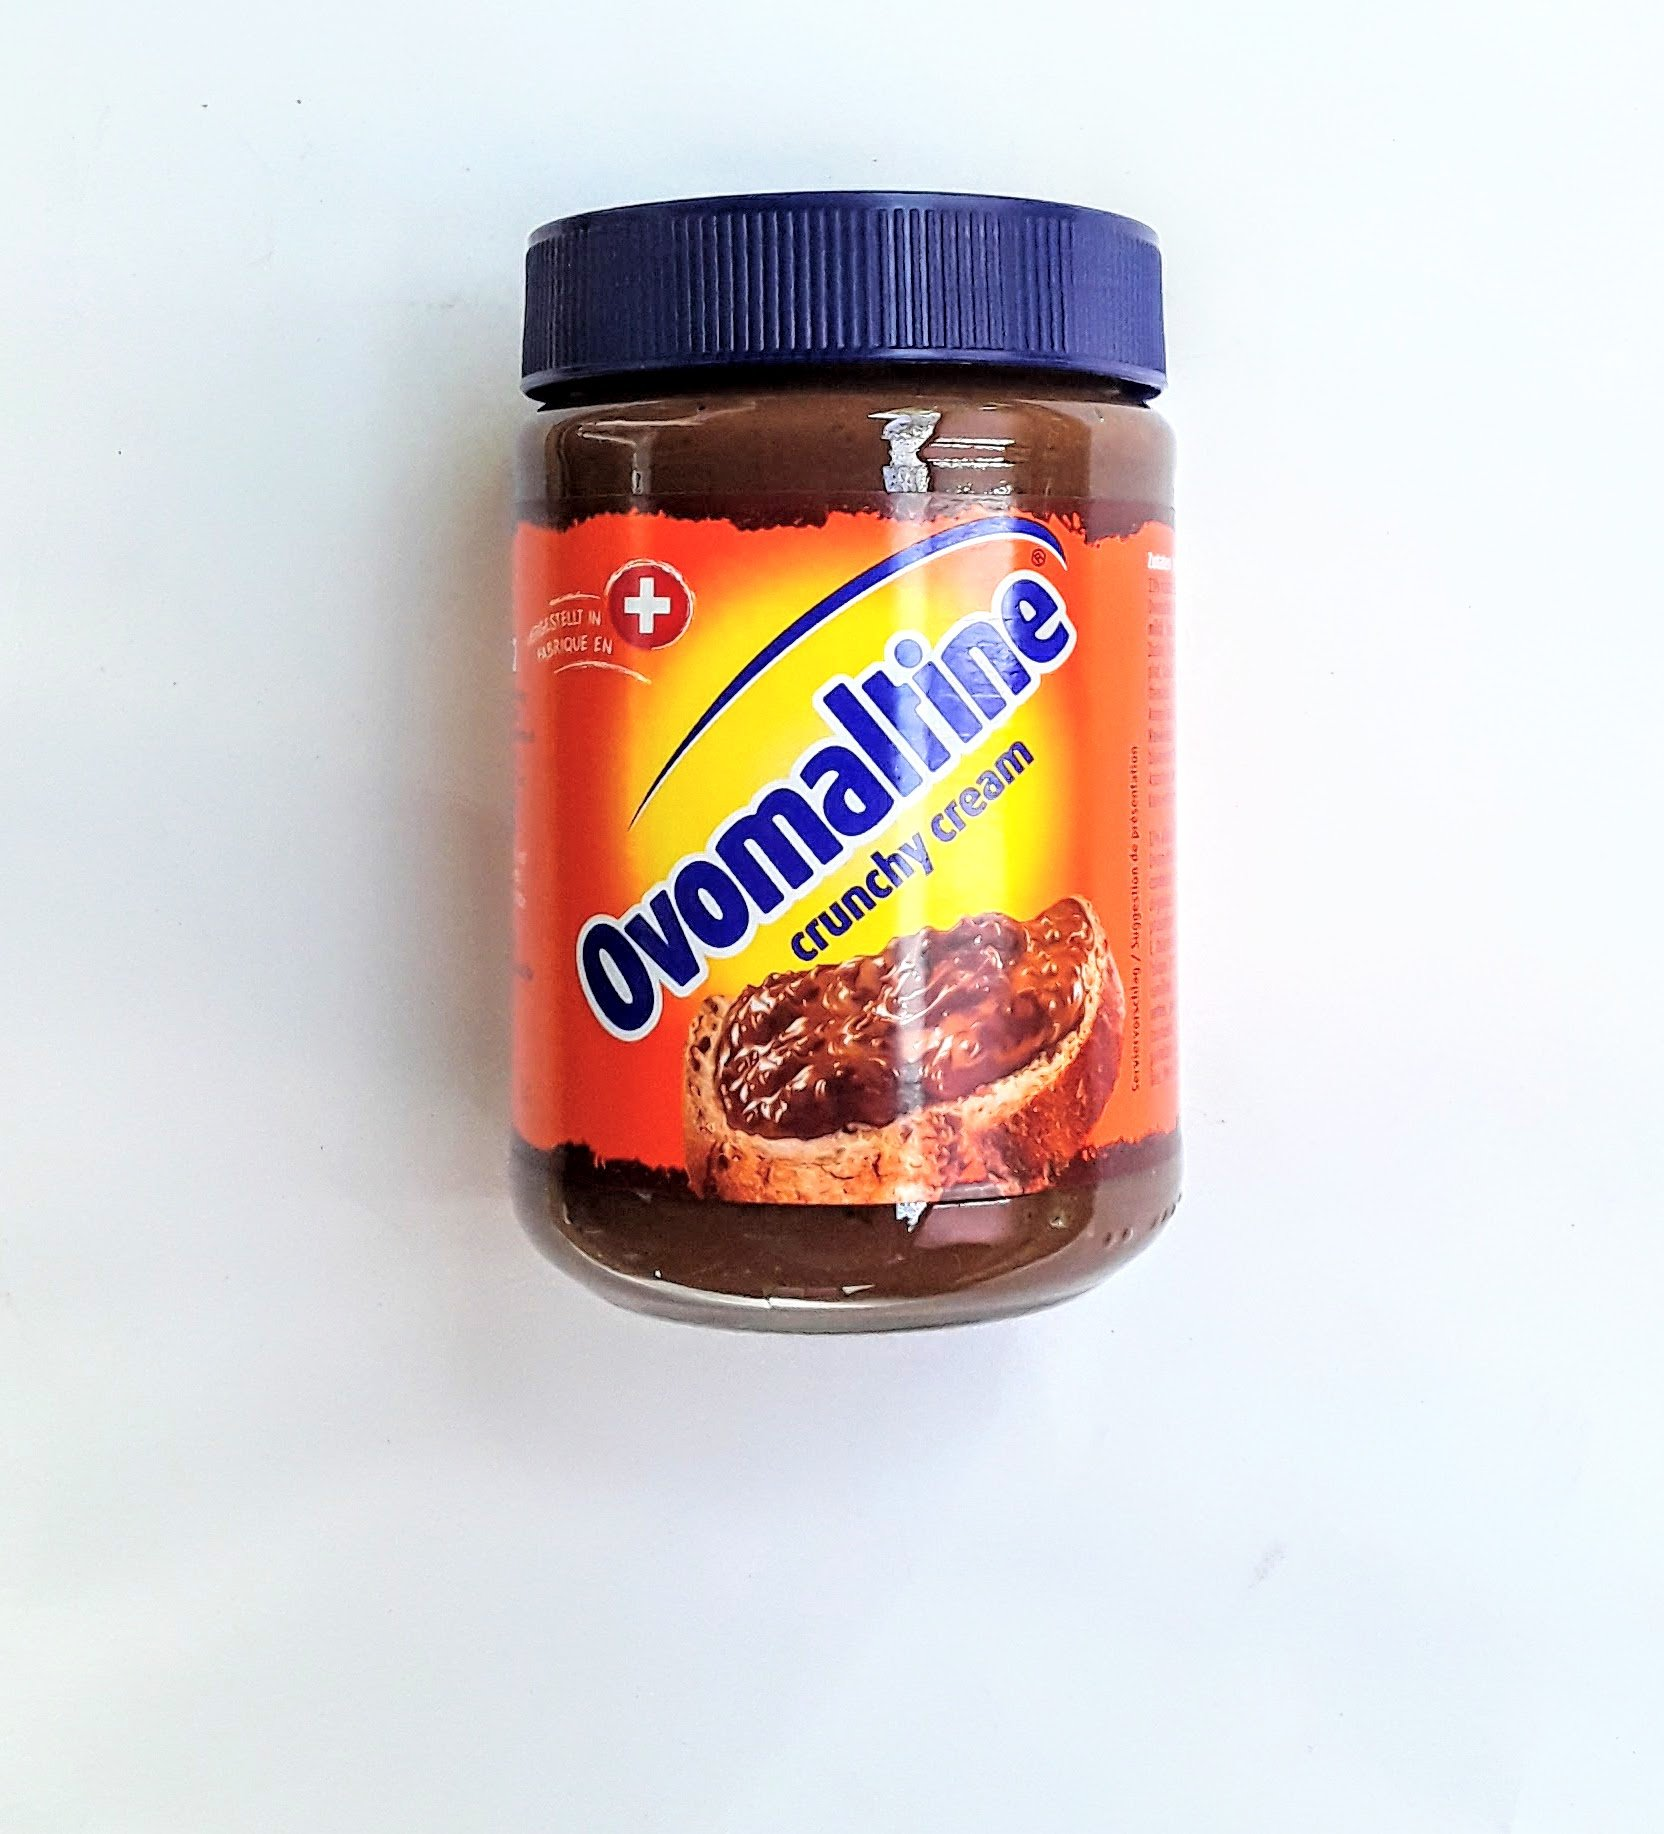 Ovomaltine Crunchy Cream, 800g (Chocolate Spread, 2 X 400g Jars)